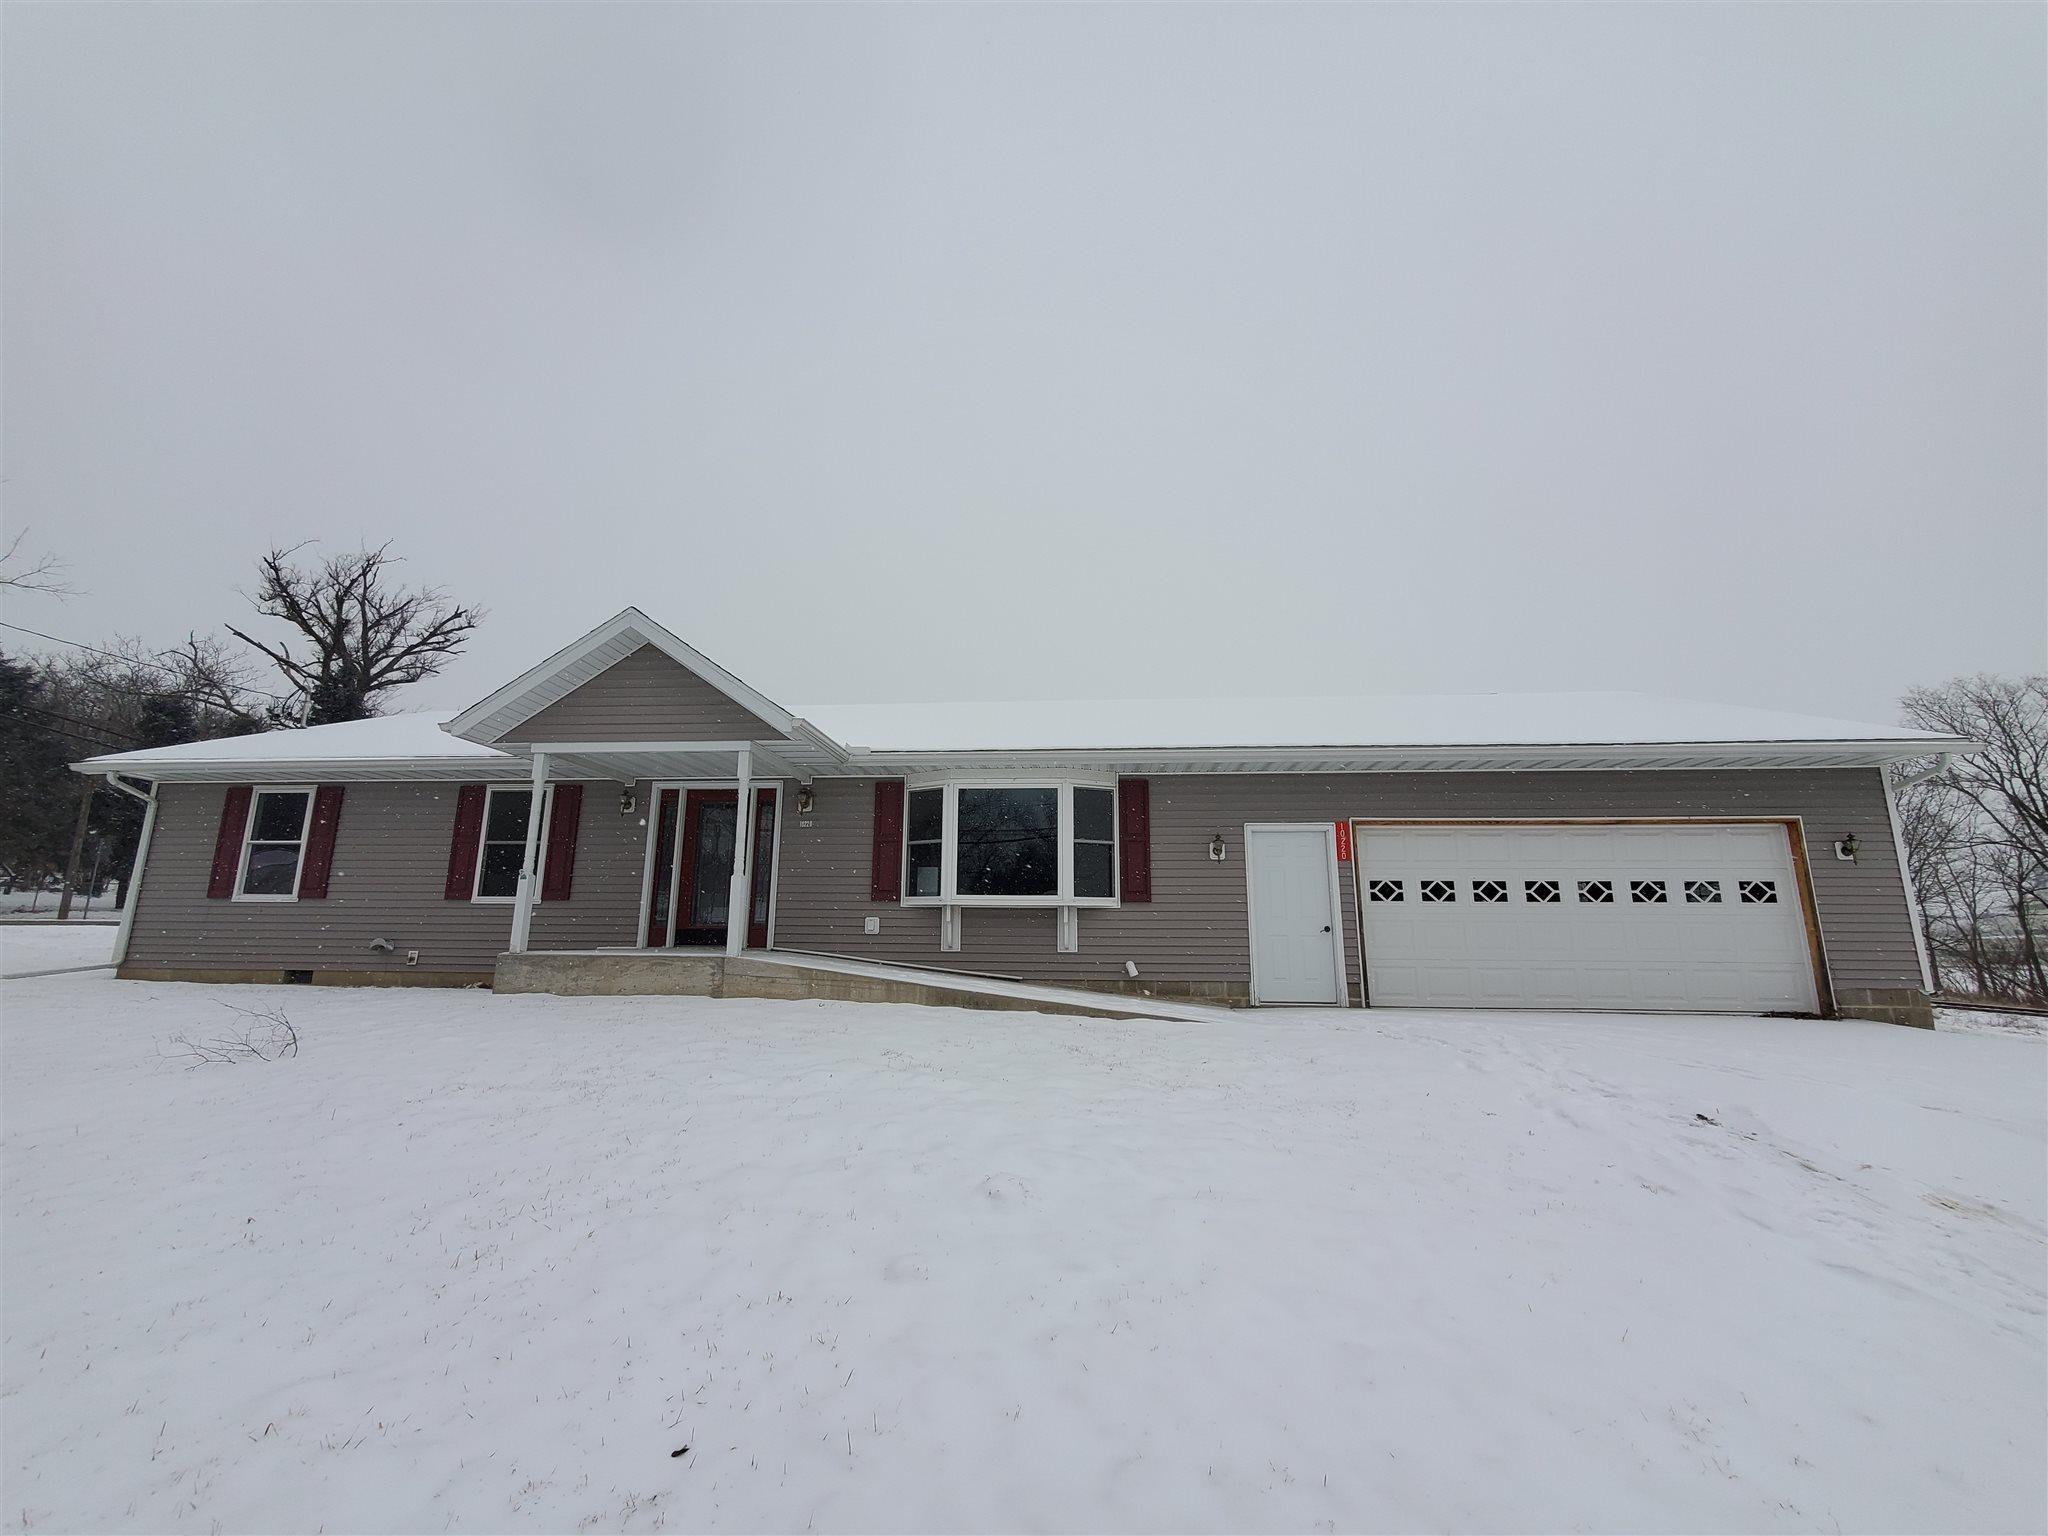 10220 S WALNUT Property Photo - Mapleton, IL real estate listing